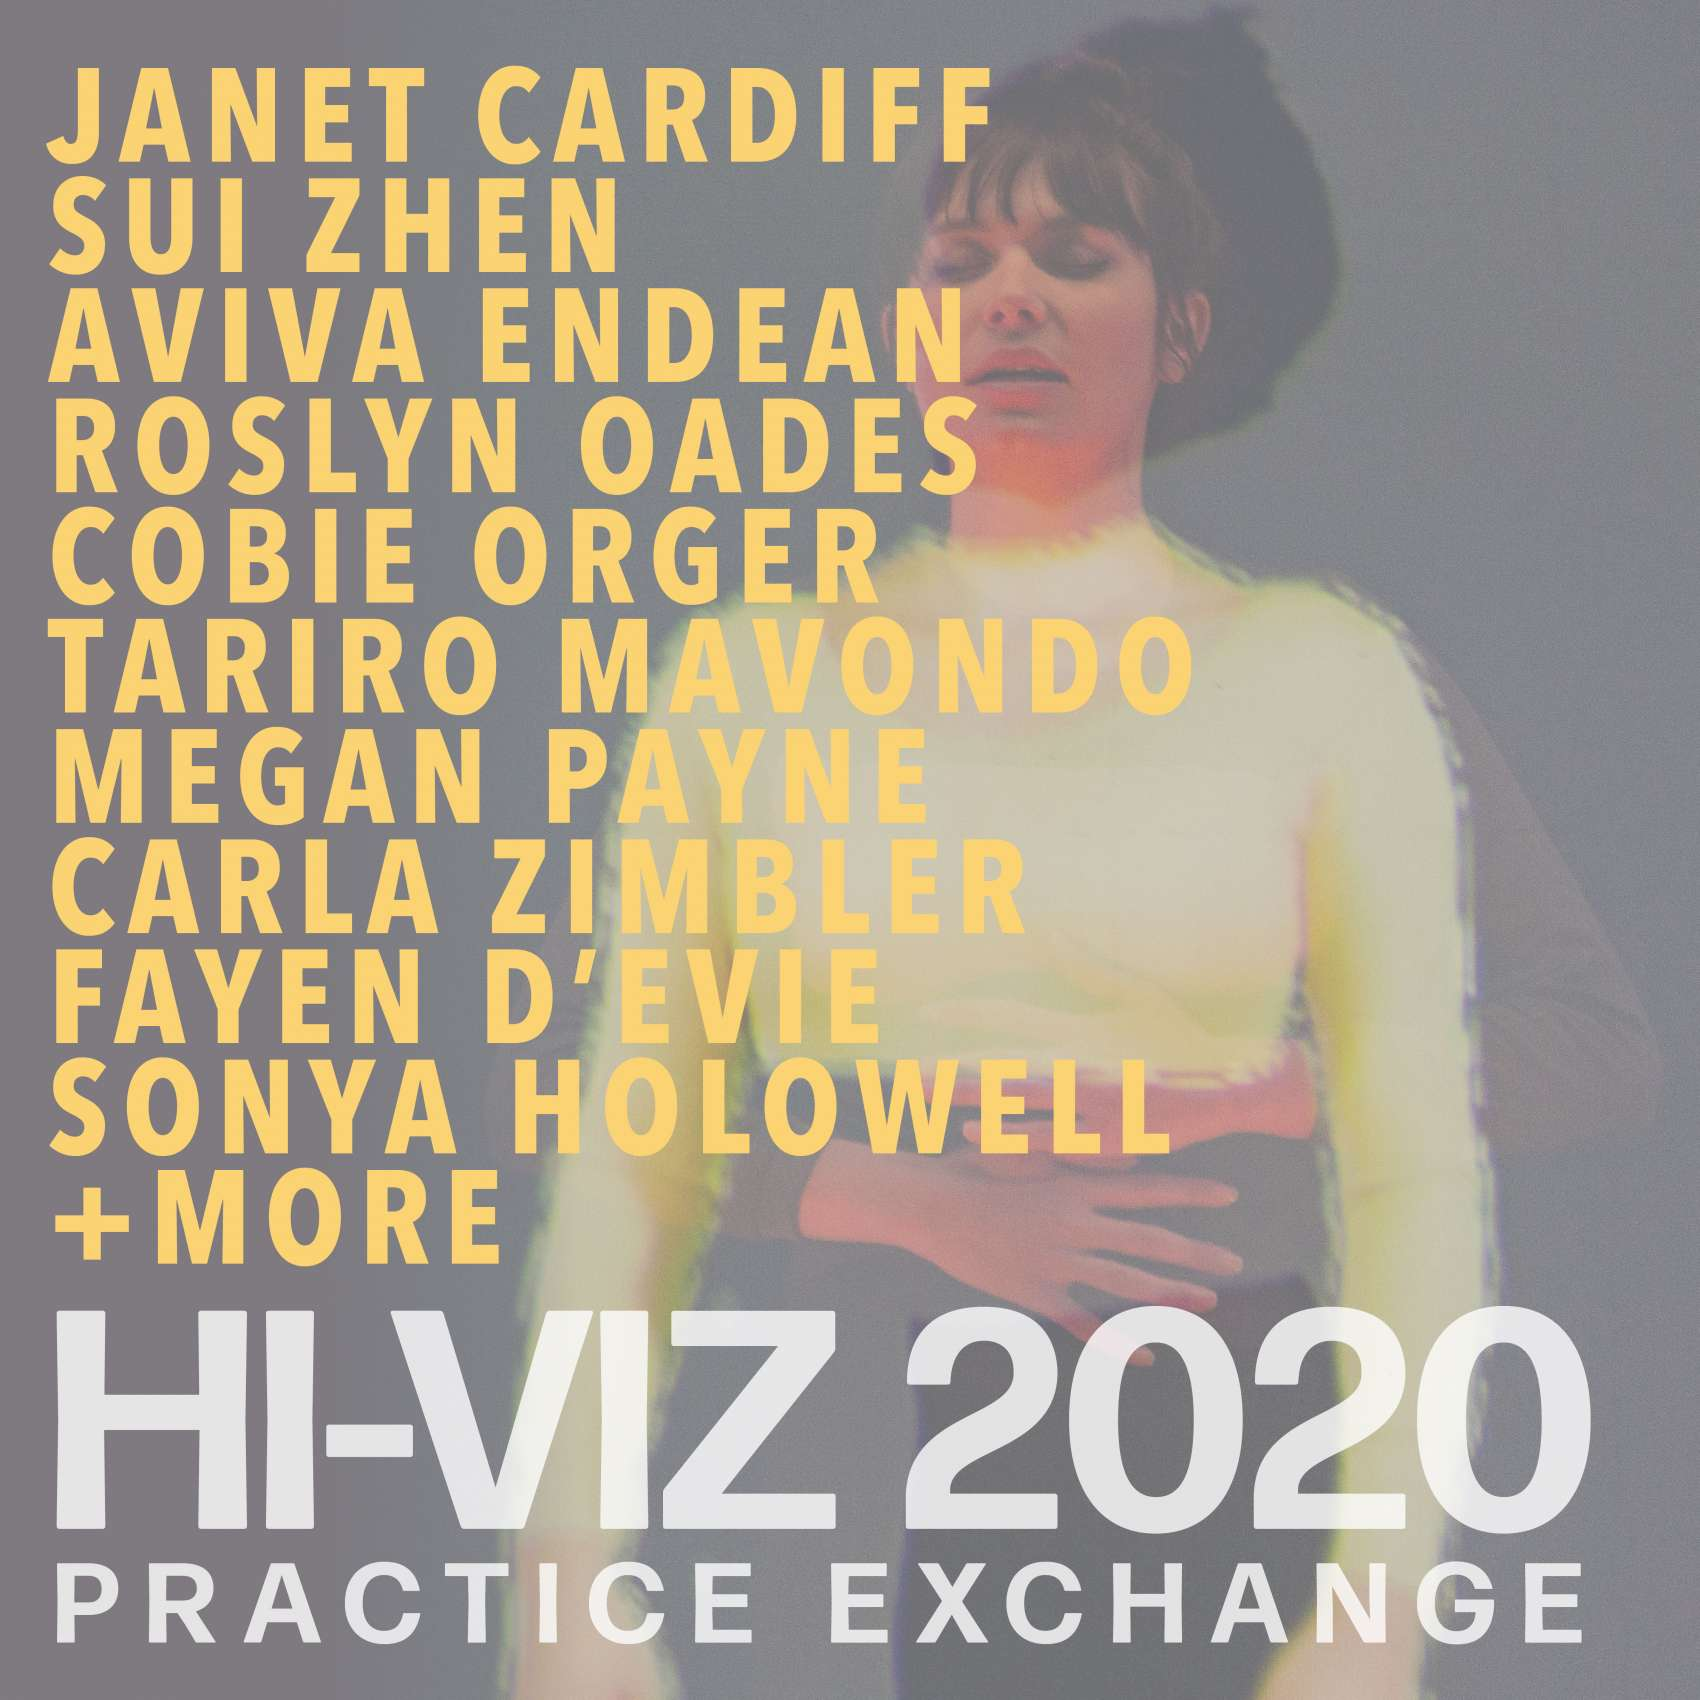 Event list of names: Janet Cardiff, Sui Zhen, Aviva Endean, Roslyn Oades, Cobie Order, Tariro Mavondo, Megan Payne, Carla Zimbler, Fayen d'Evie, Sonya Holowell + more: Hi-Viz 2020 Practice Exchange